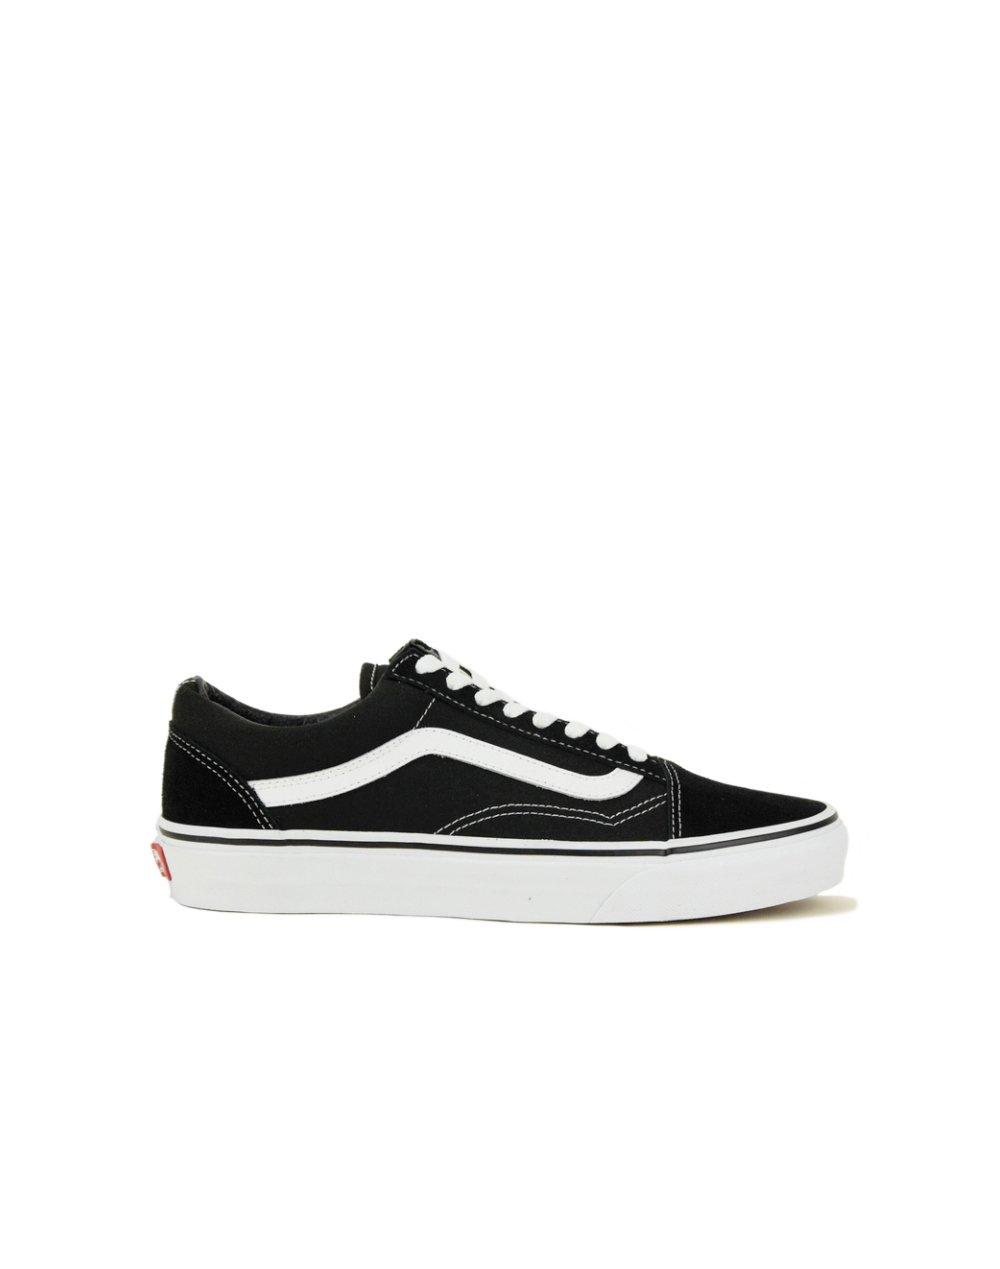 Vans Old Skool (VN000D3HY281) Black/White